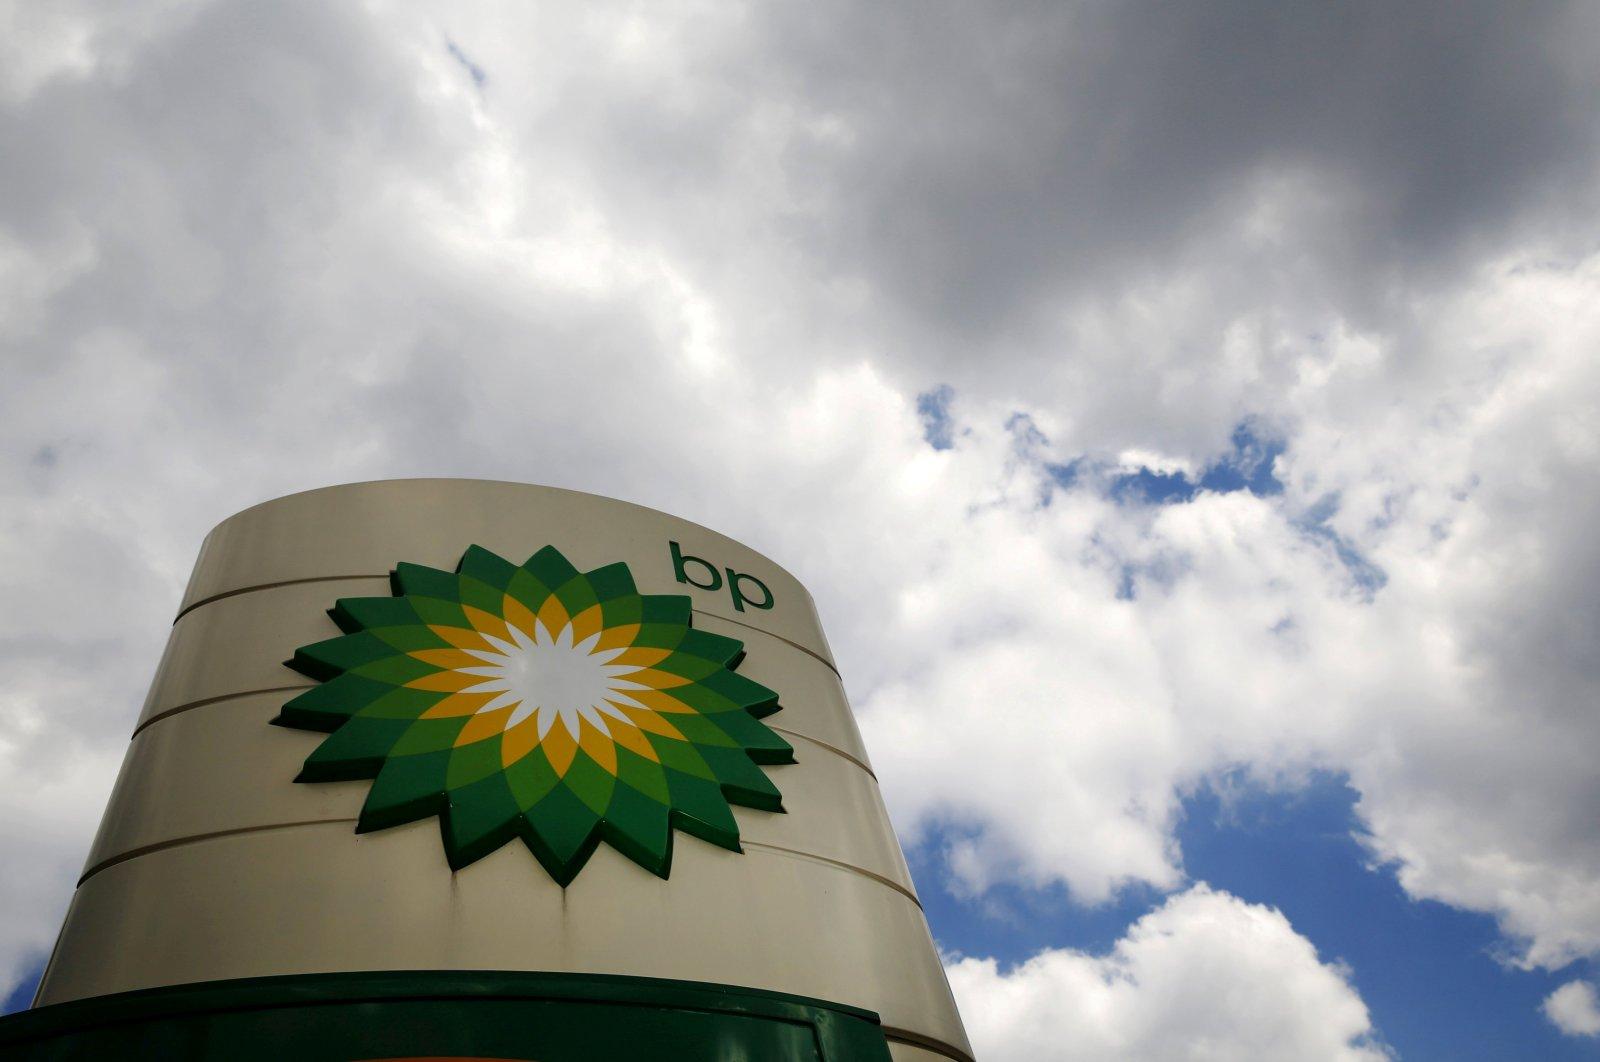 Signage at a BP petrol station in London, U.K. (Reuters Photo)